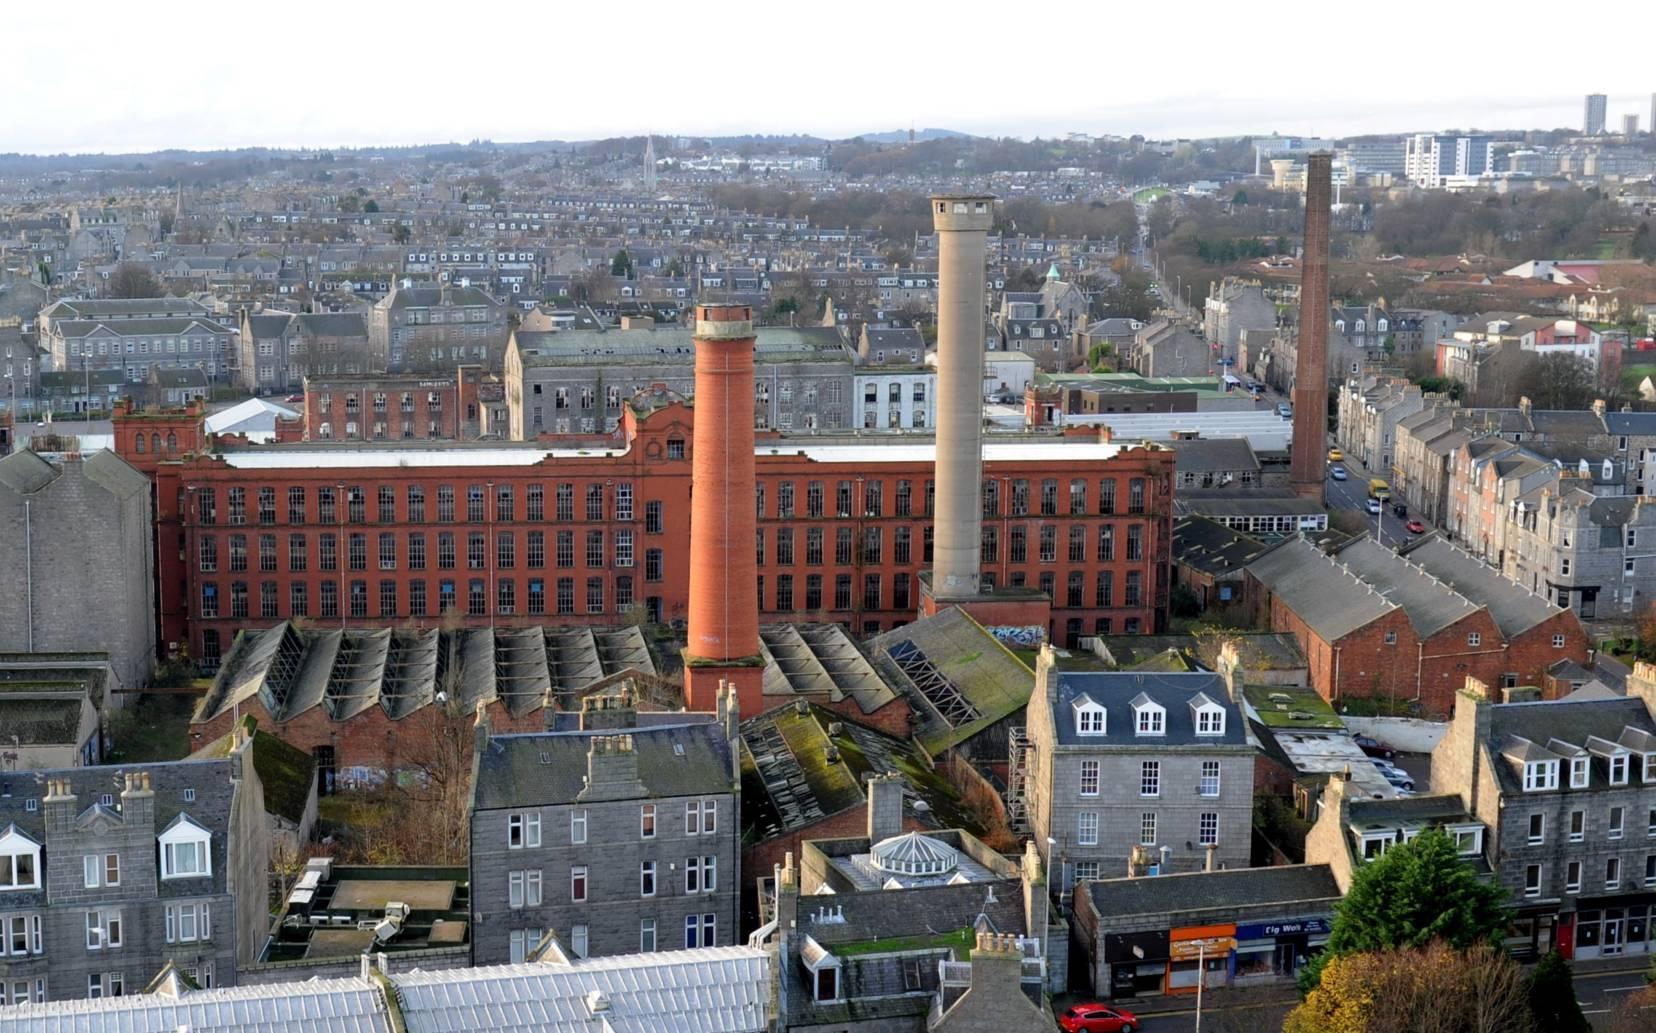 Broadford Works site in Aberdeen.